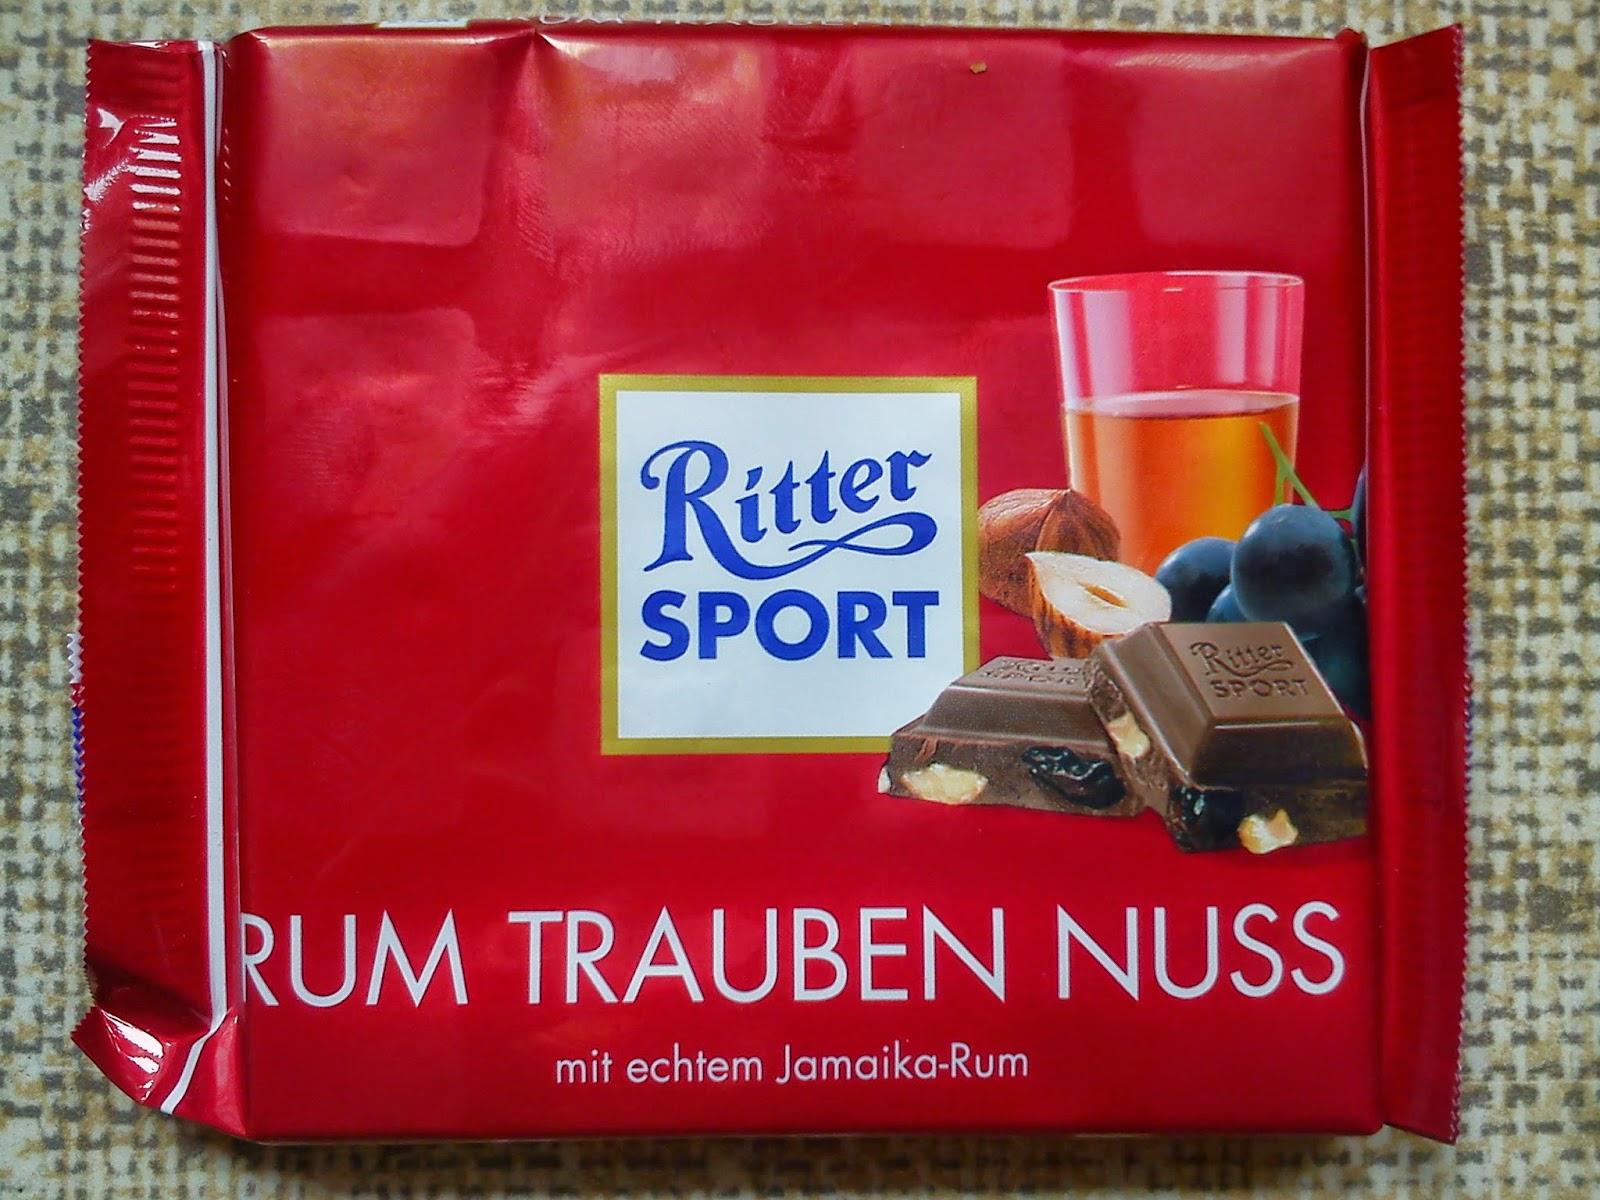 Ritter Sport Trauben Nuss